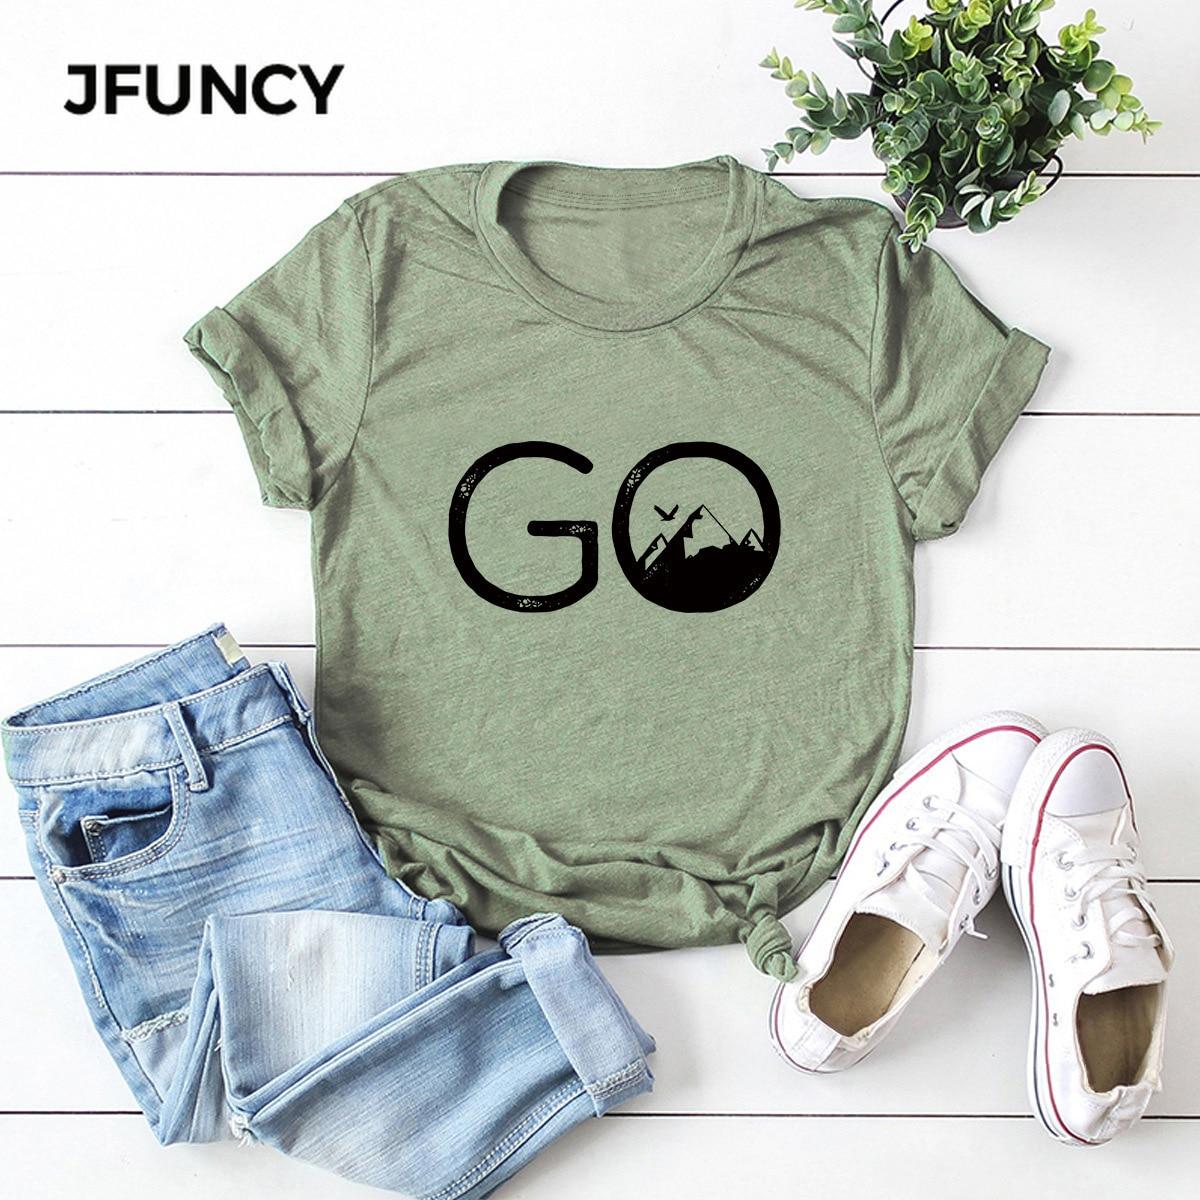 JFUNCY Plus Size Women T Shirt Go Hike Print Short Sleeve Tees Woman Tops Casual T-shirts 100% Cotton Female Tshirt